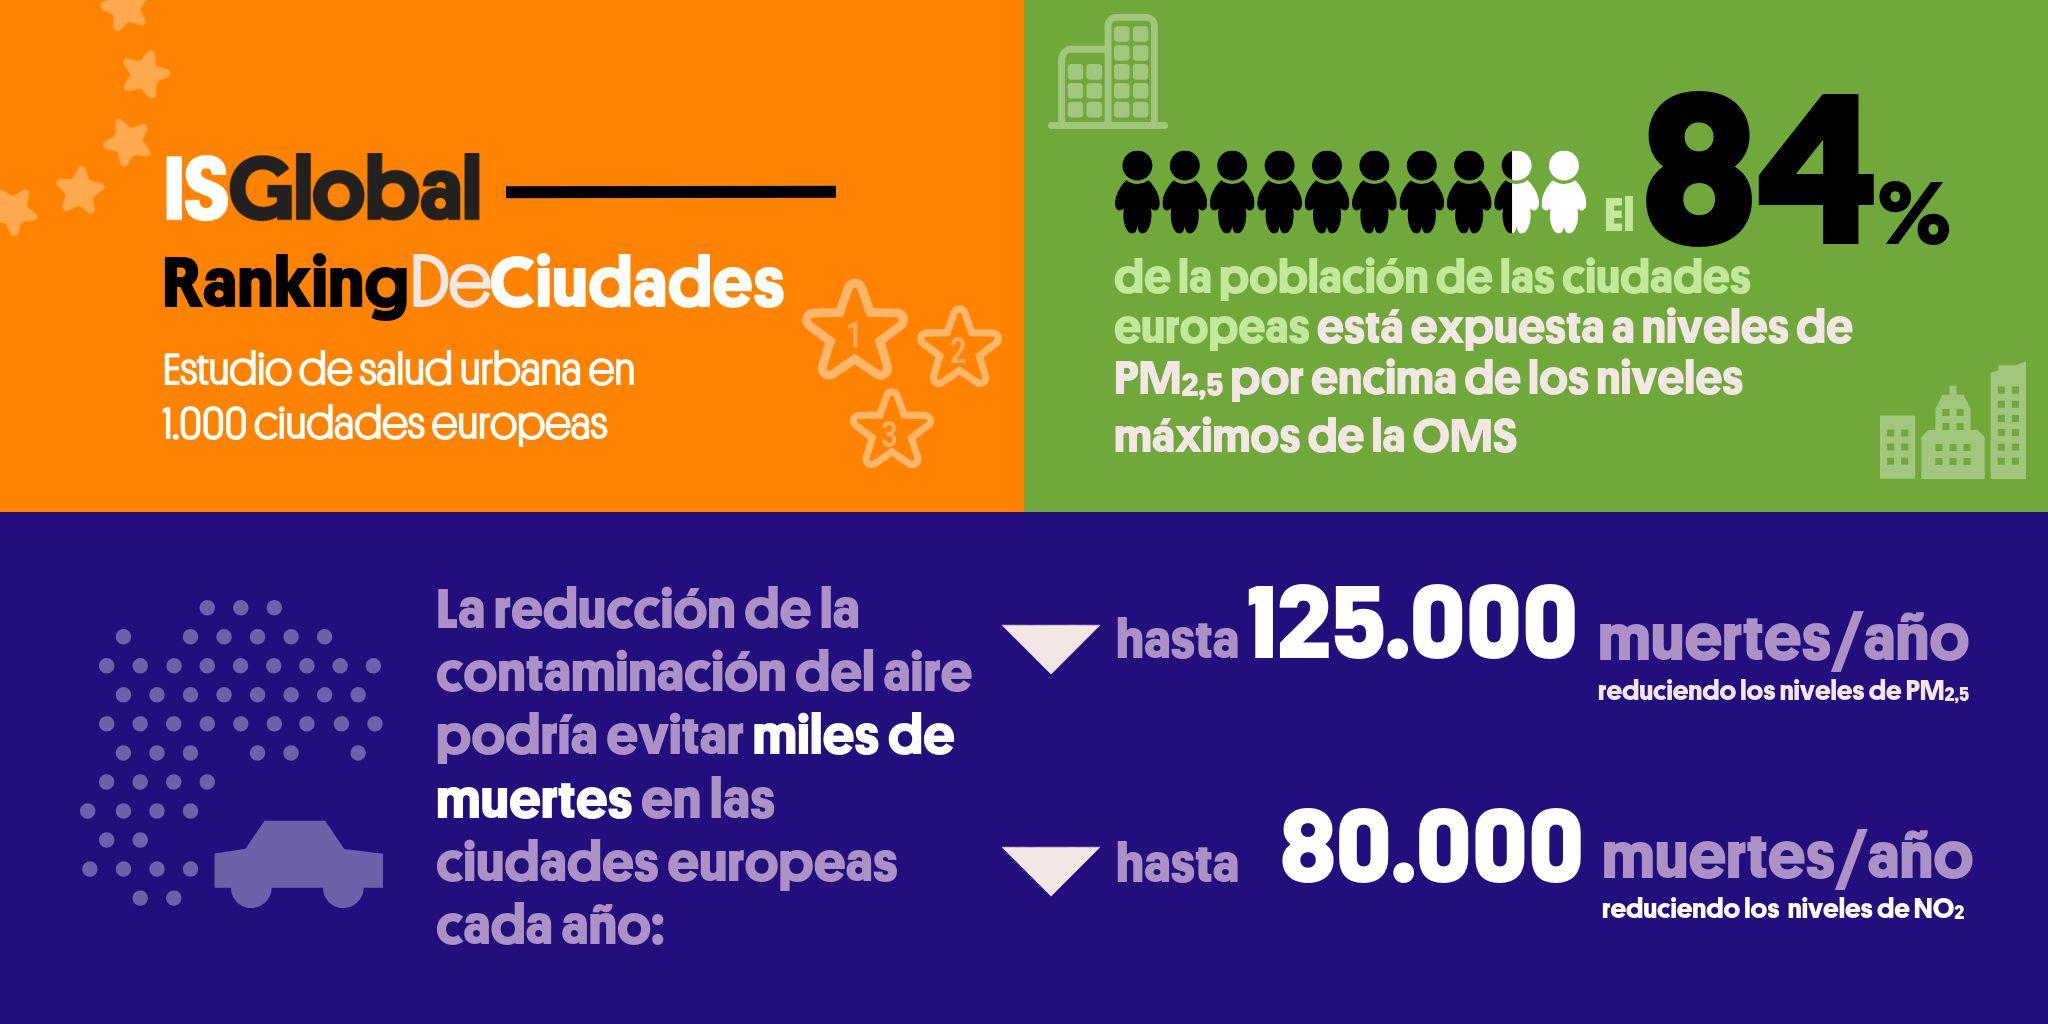 ISGlobal Ranking de ciudades - Datos globales